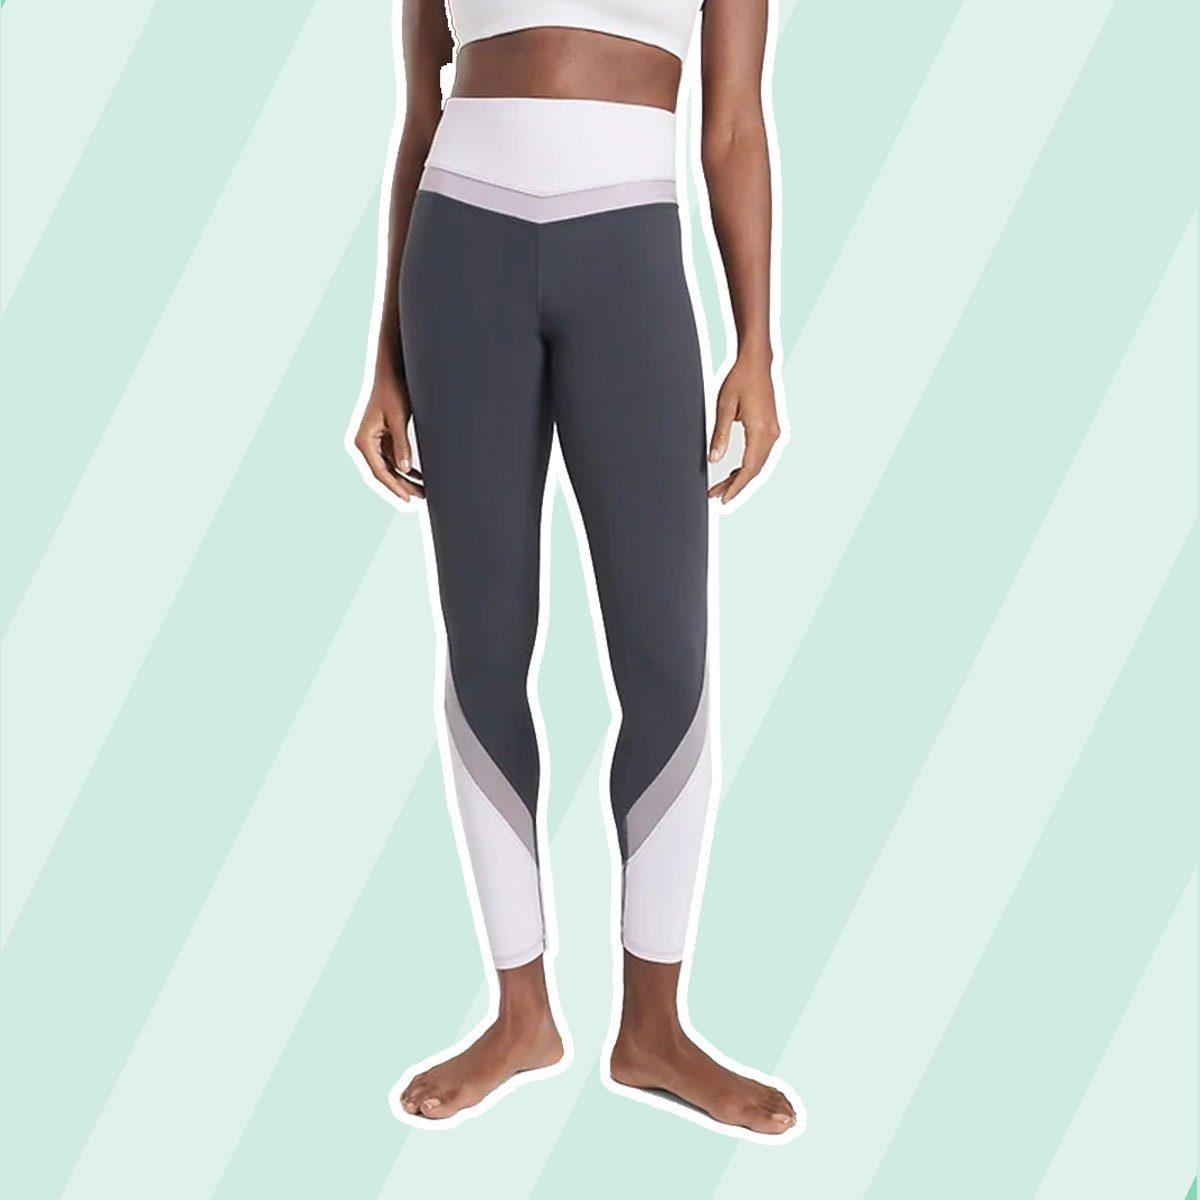 High-Quality Yoga Pants